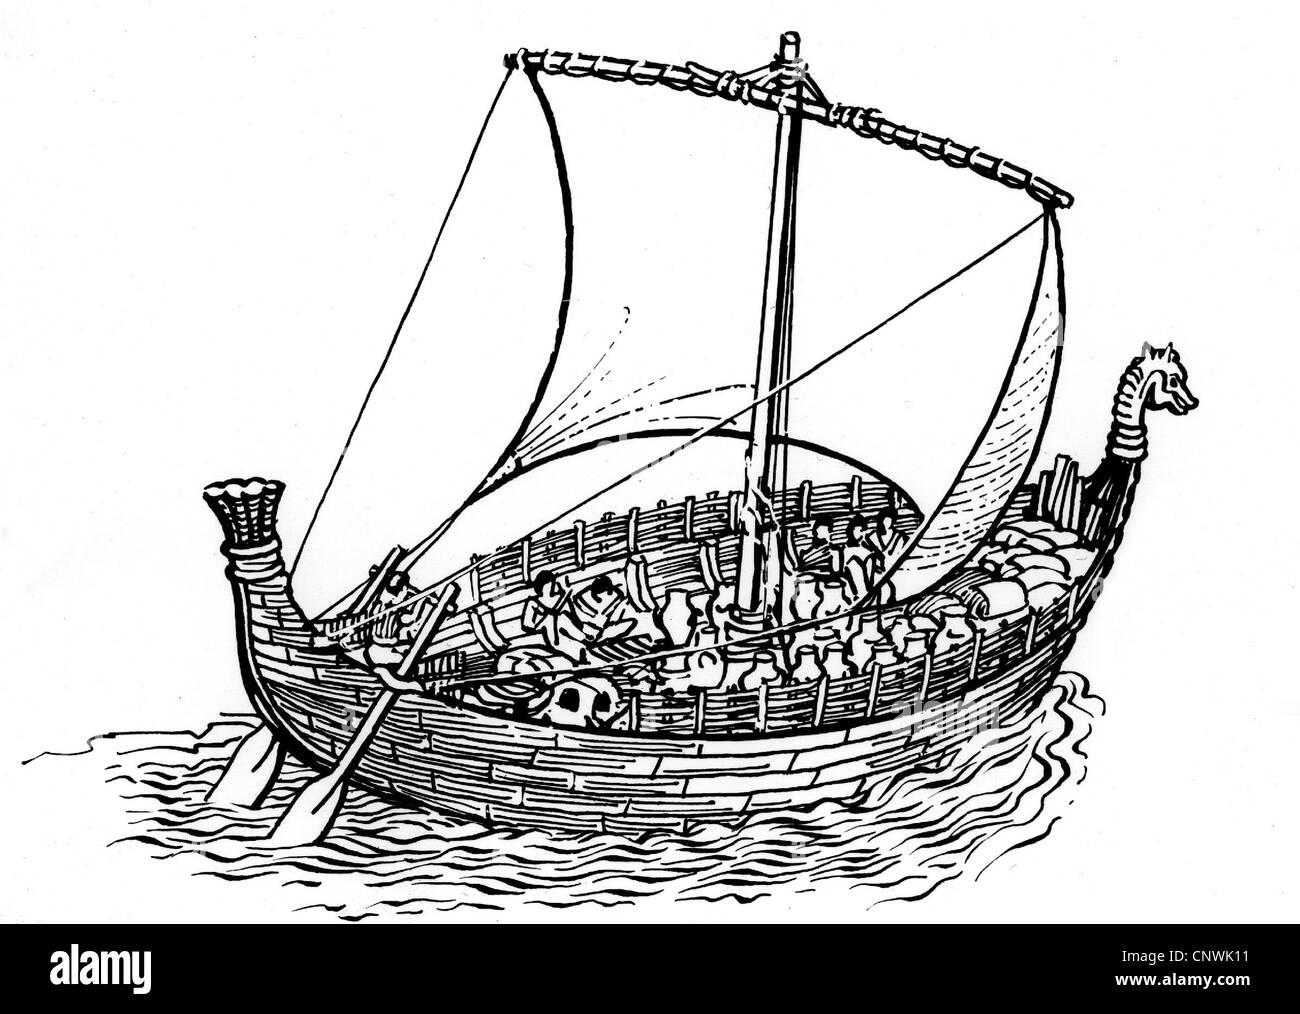 transport / transportation, ancient world, Phoenician merchant ship, reconstruction, 19th century, drawing, dragonboat, - Stock Image